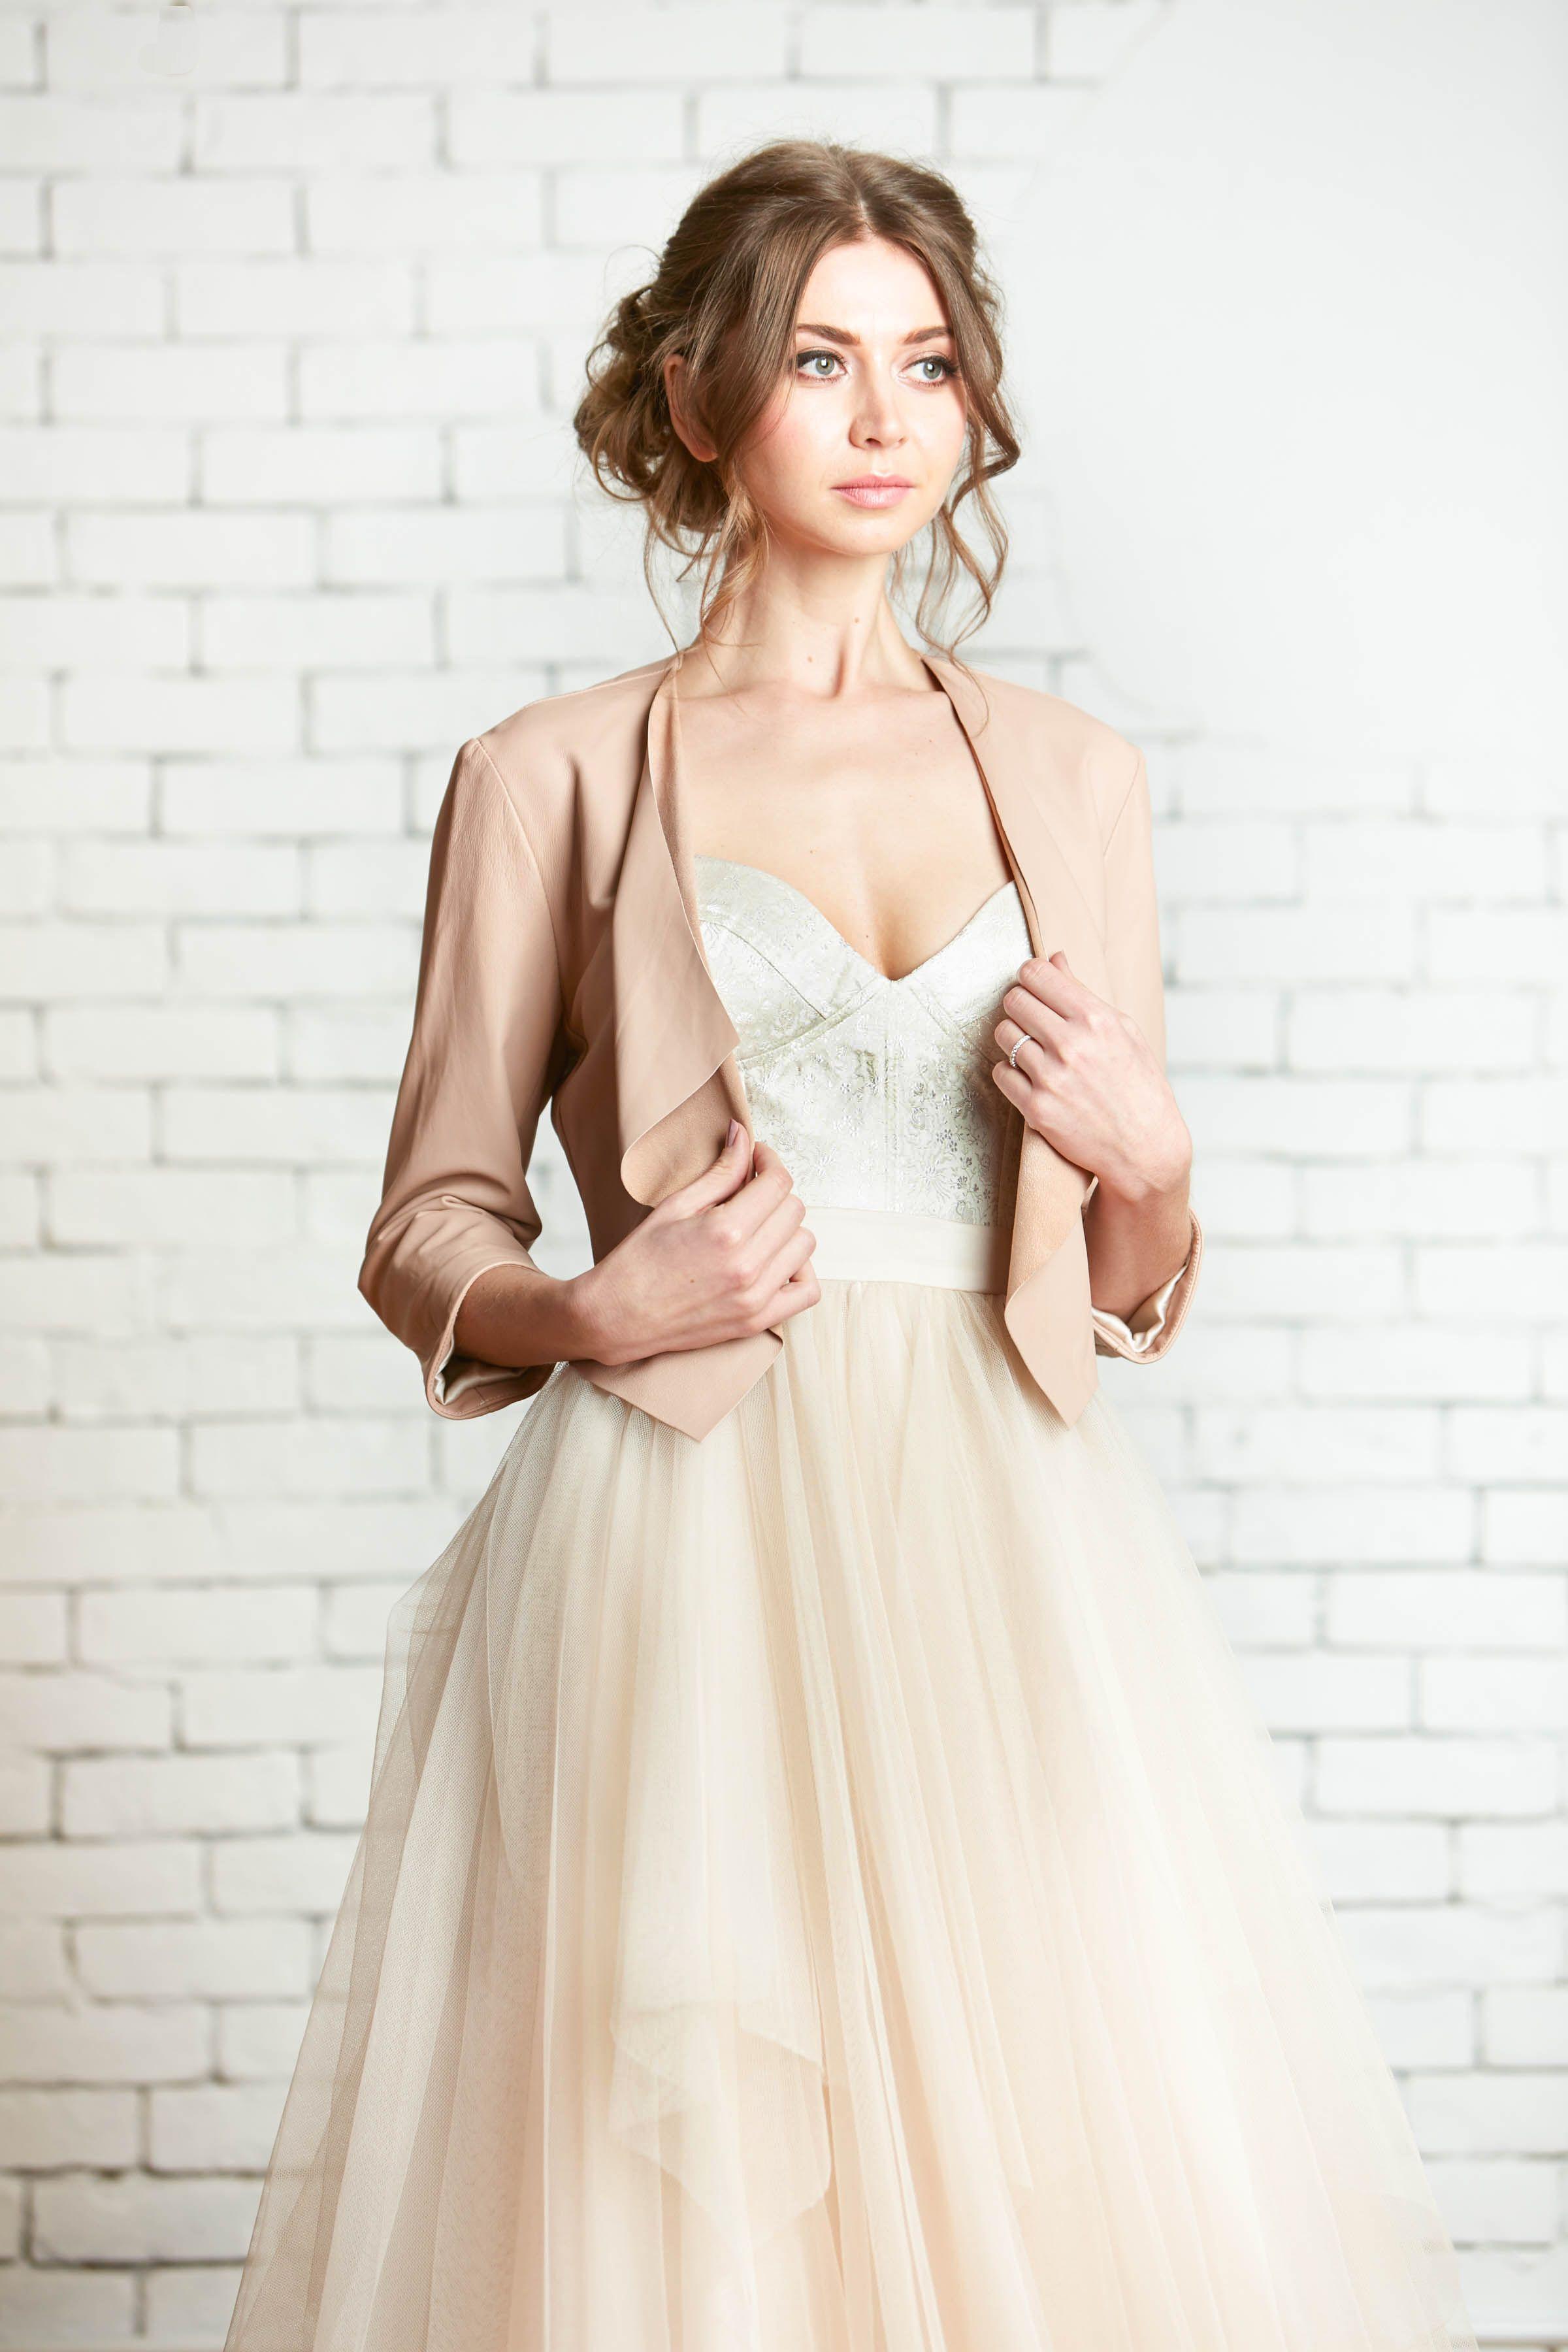 Rebecca Schoneveld Bridal Gown The Verona Leather Jacket Avery Mckinley Wedding Gown Handmade In Brooklyn Vestito Da Sposa Sposa Vestiti [ 3600 x 2400 Pixel ]